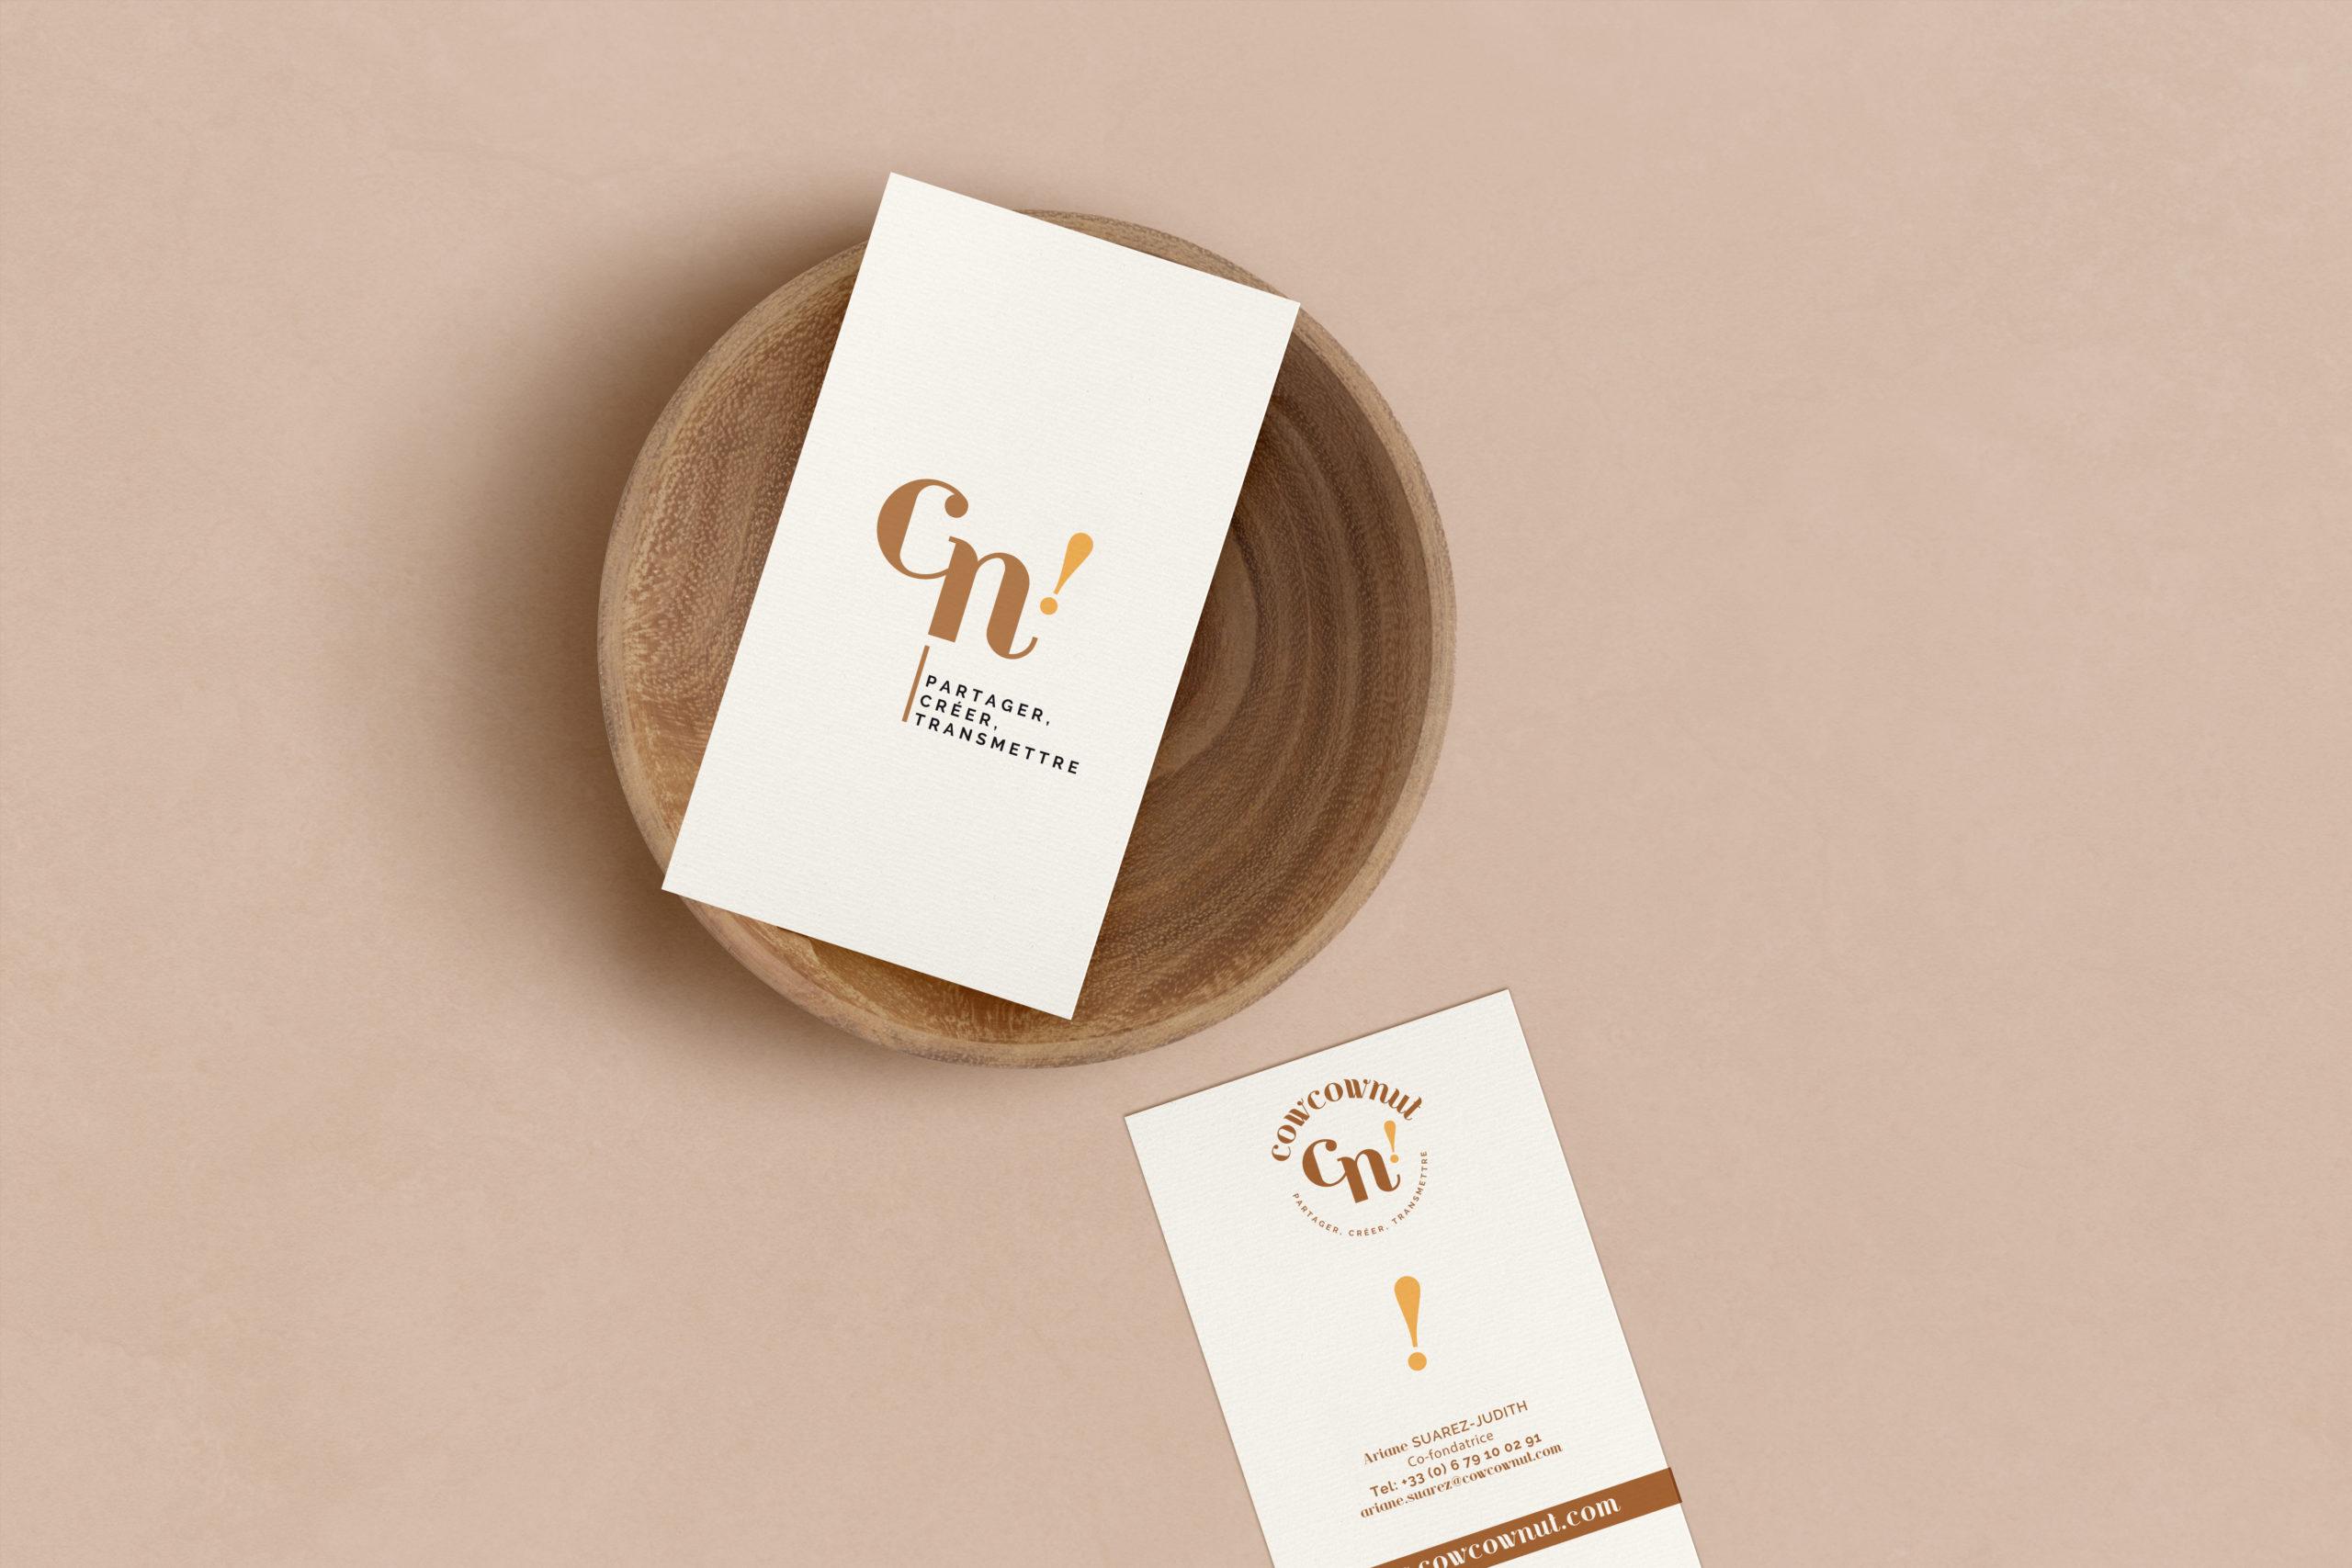 Branding marque cowcownut Chic Studio